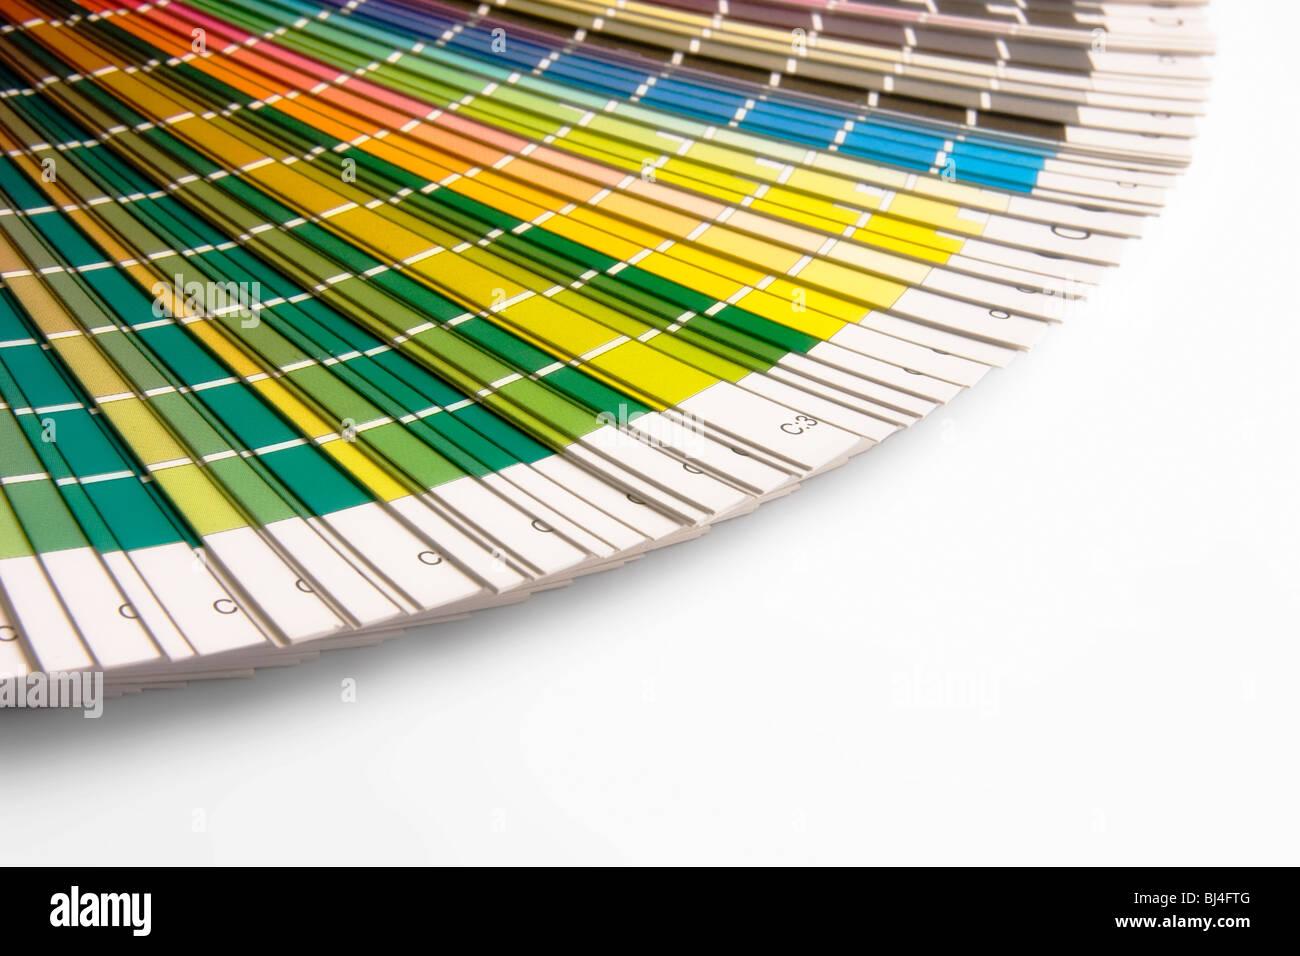 Pantone Chart Stockfotos & Pantone Chart Bilder - Alamy